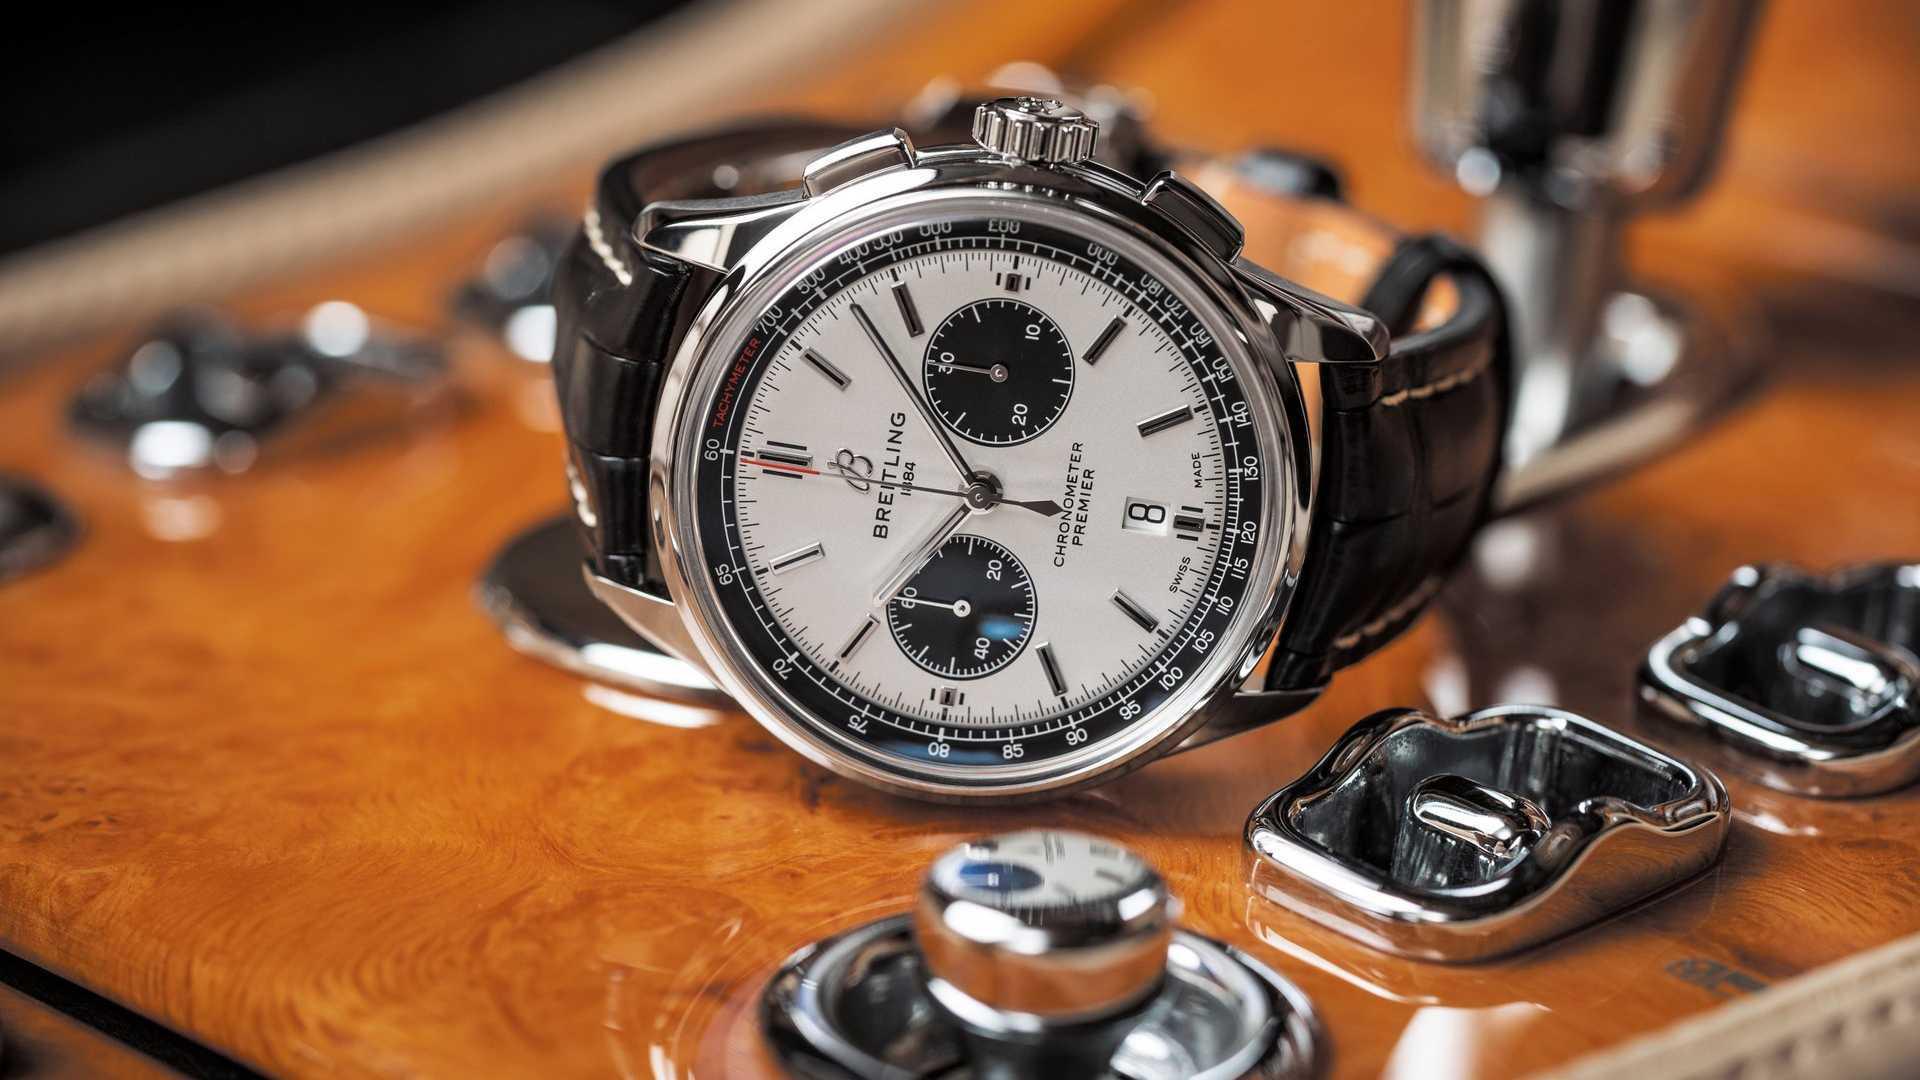 Breitling PremierBO1 Chronograph